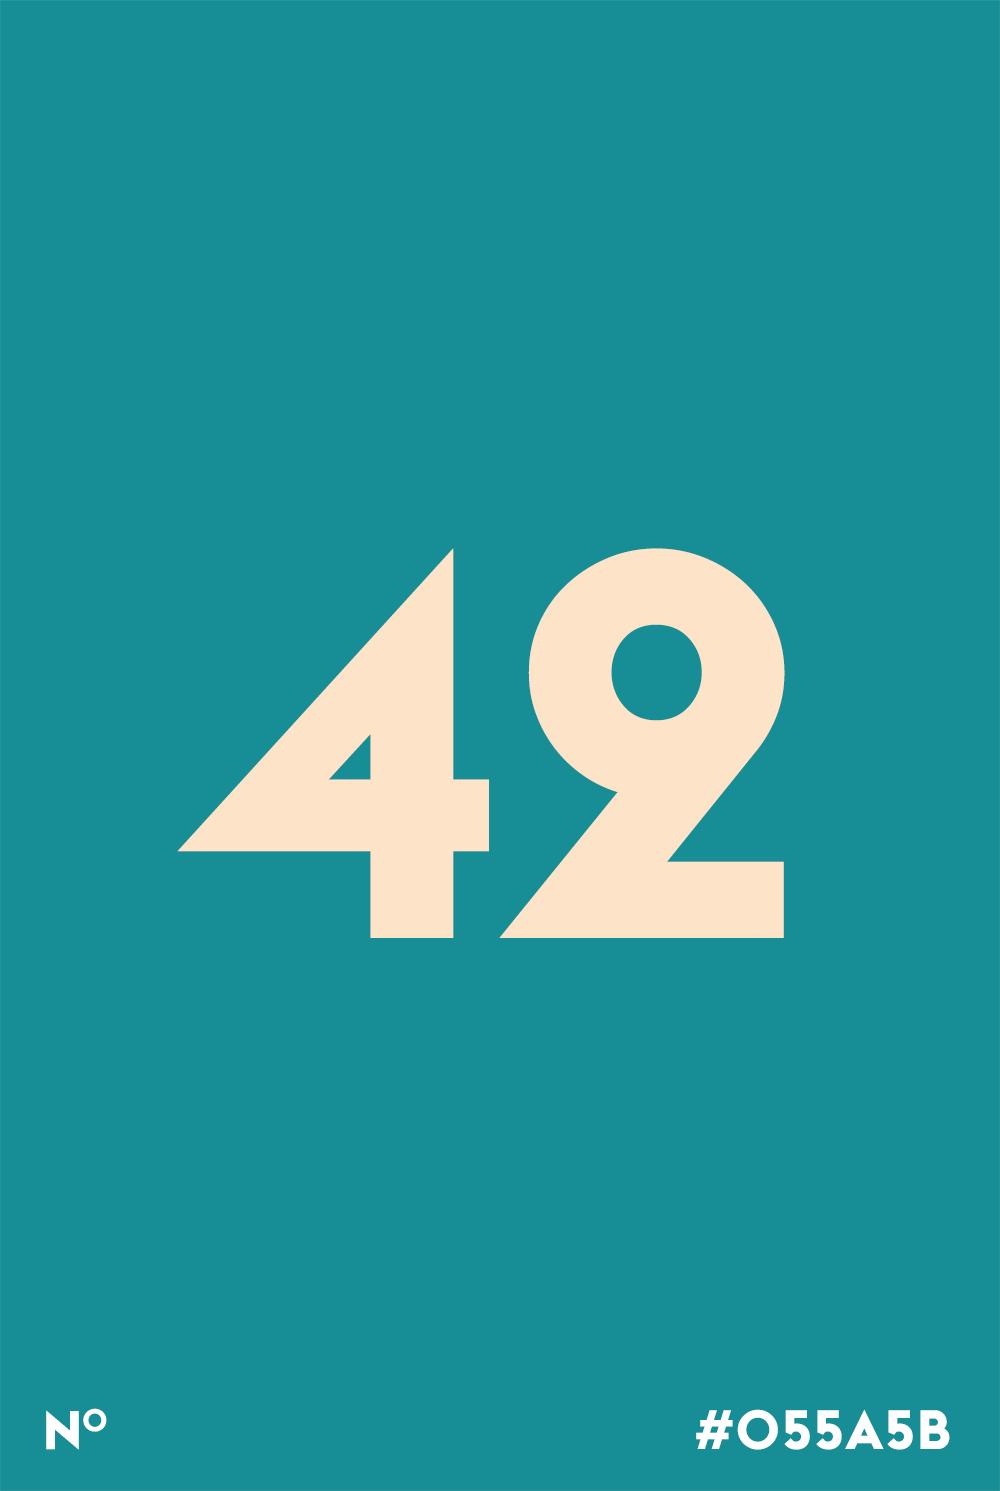 cc_0041_42